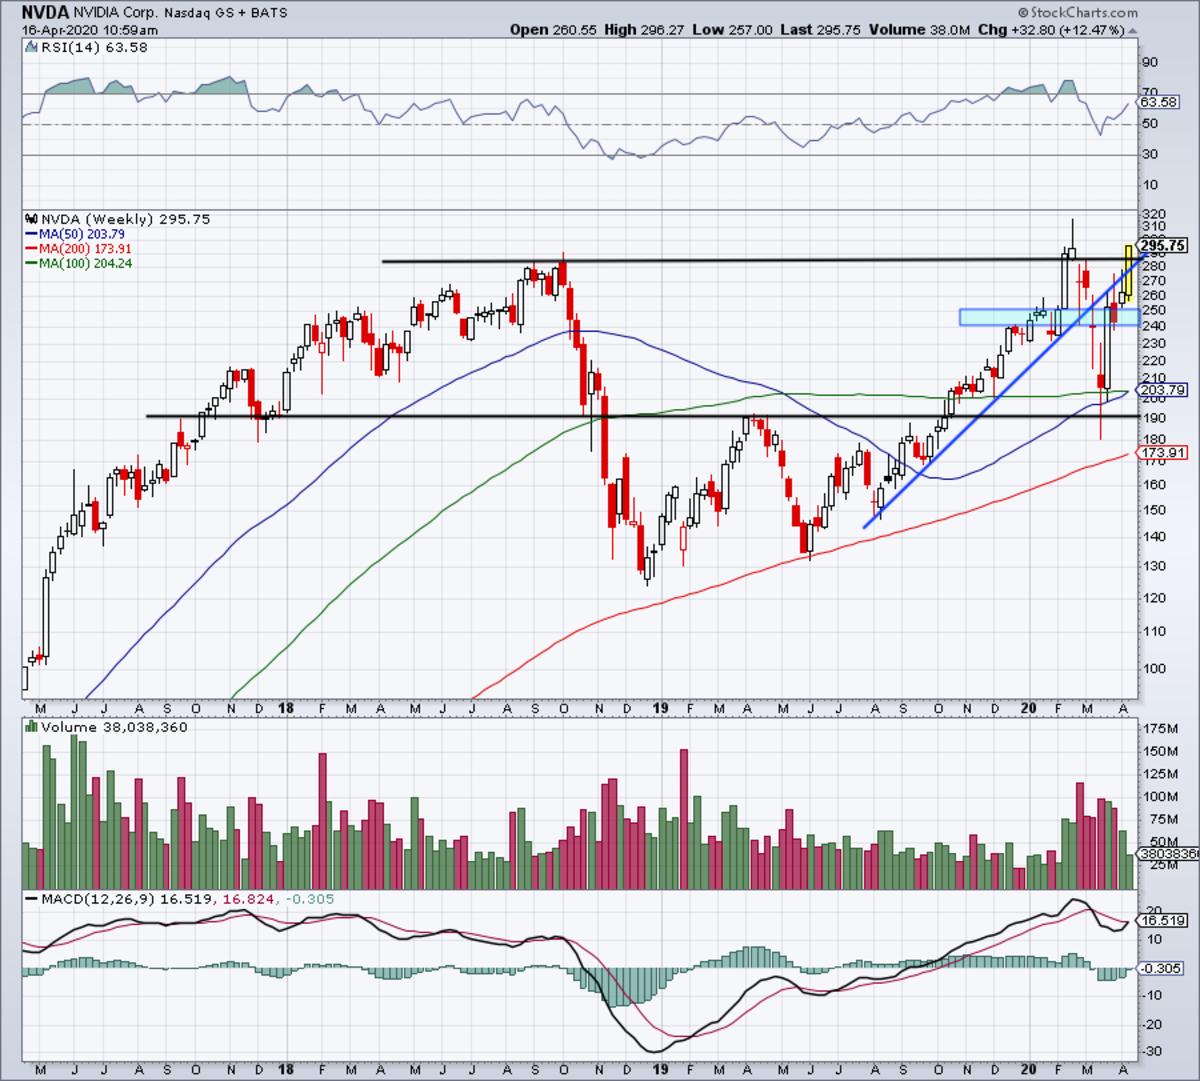 Weekly chart of Nvidia stock.